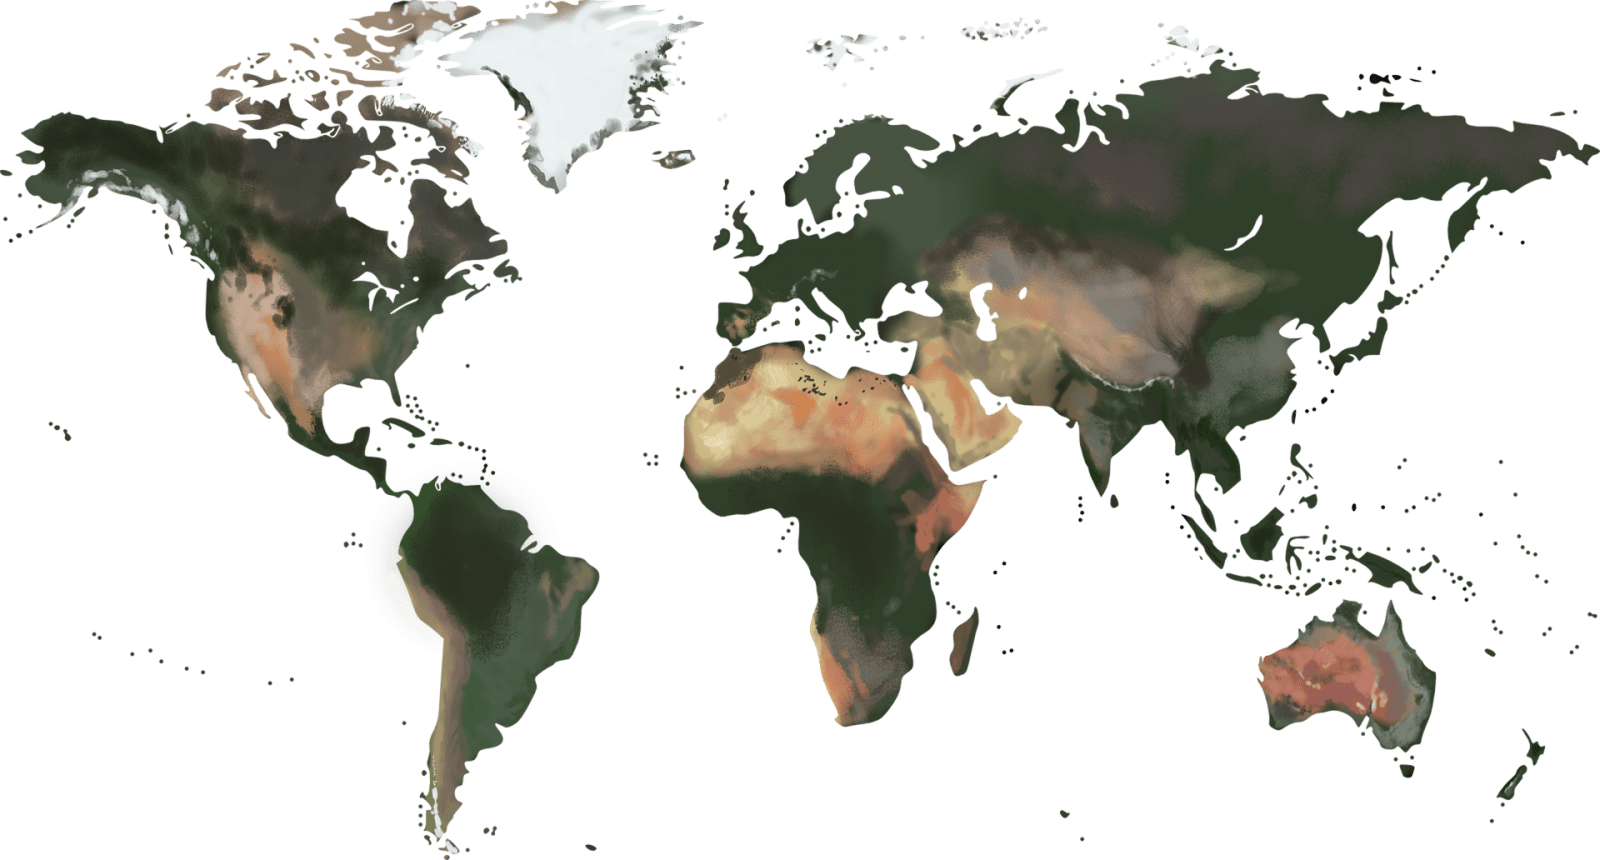 world map 4460639 1920